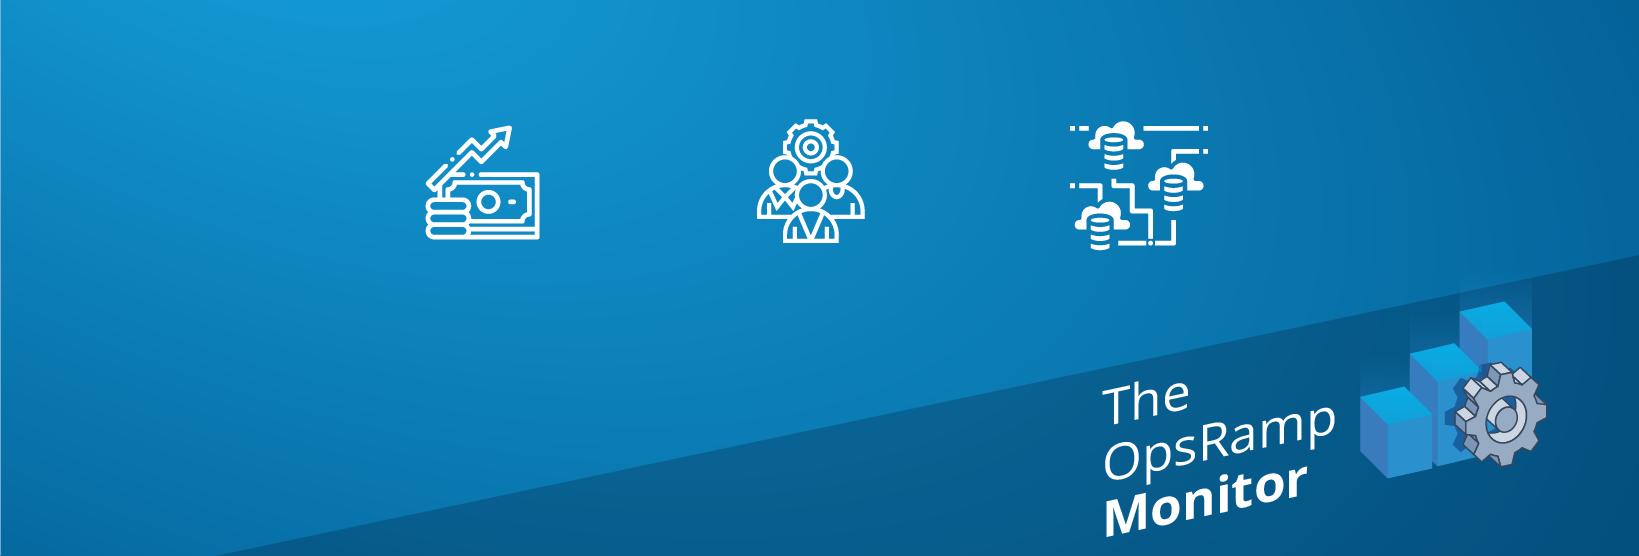 The OpsRamp Monitor: SRE Salaries, DevOps Teams, Multi-Cloud Survey